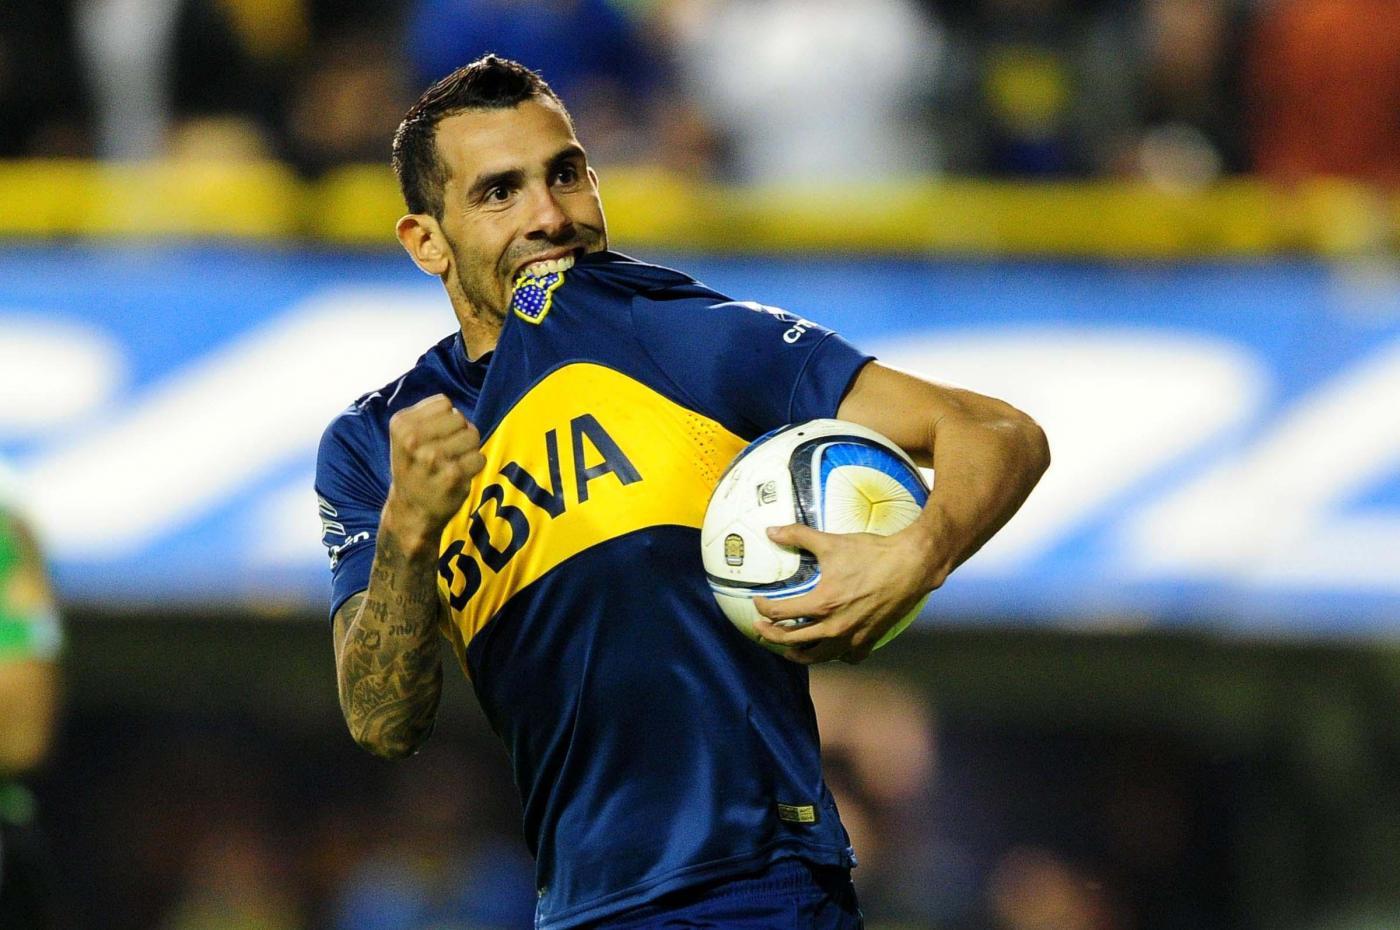 Argentina Torneo de Verano mercoledì 17 gennaio